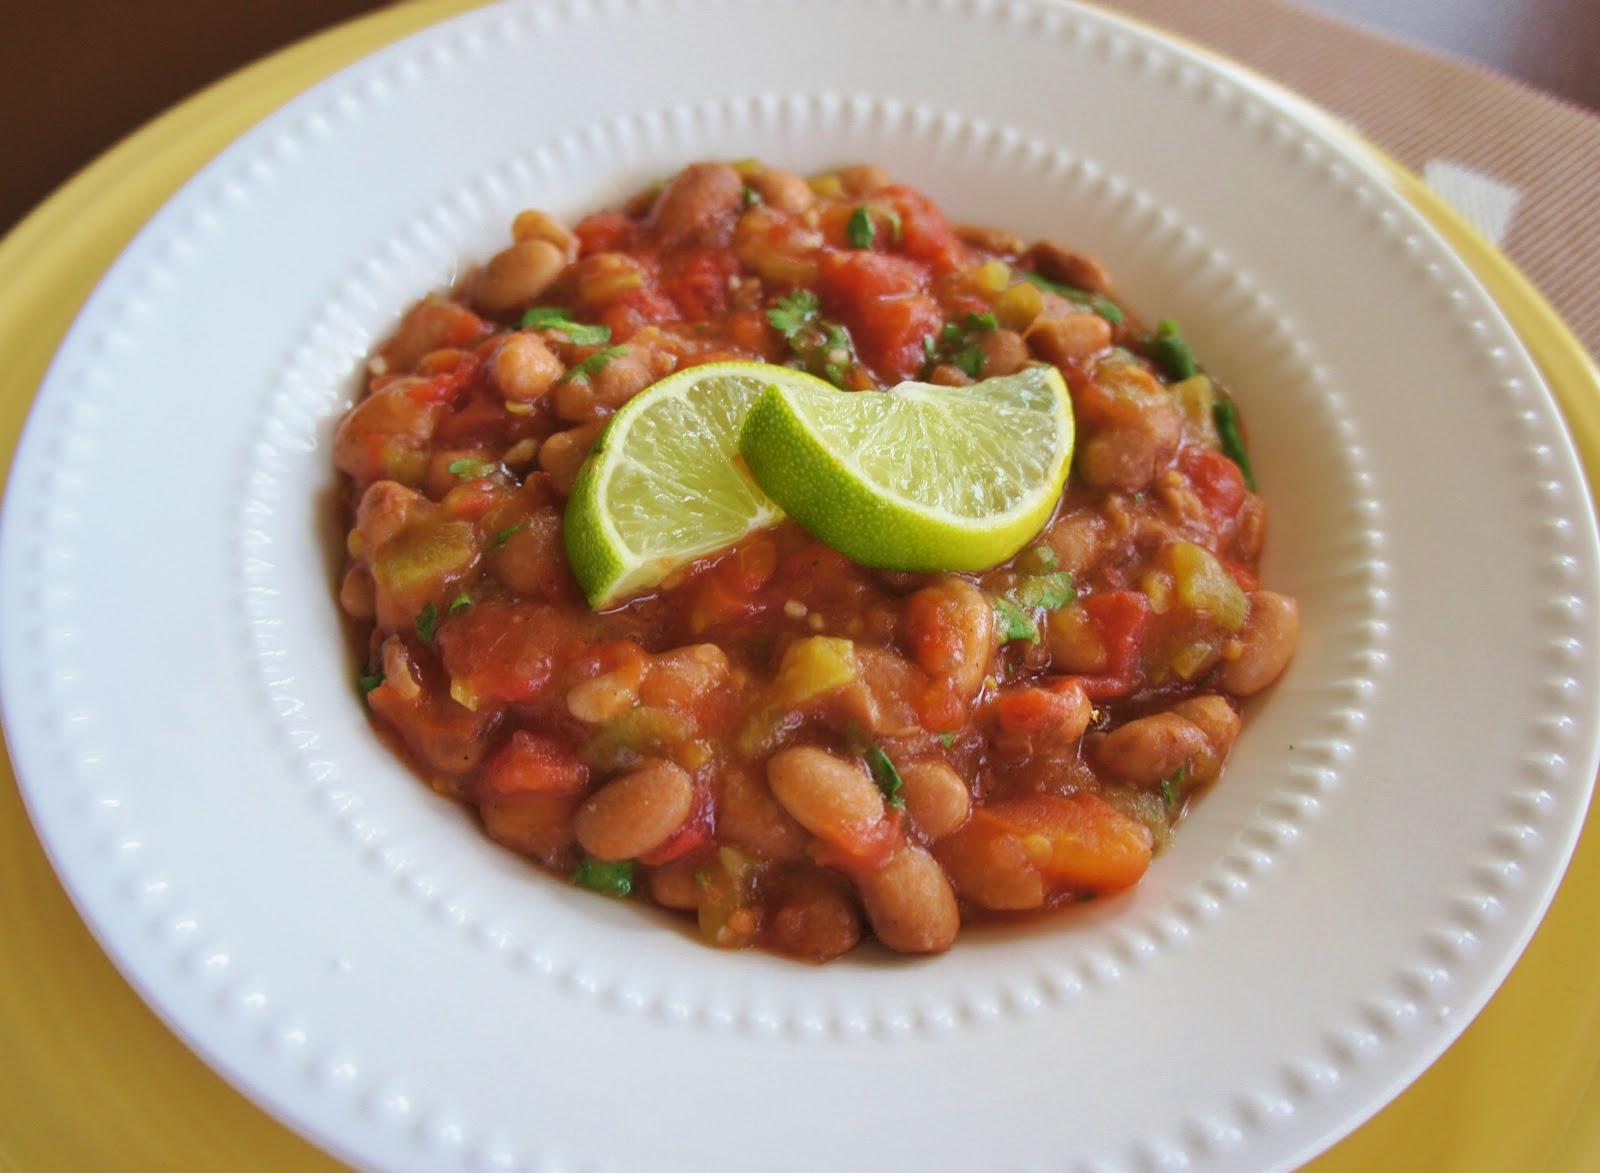 Recipe for slow cooker vegan fiesta baked beans 365 for Healthy crock pot recipes vegetarian